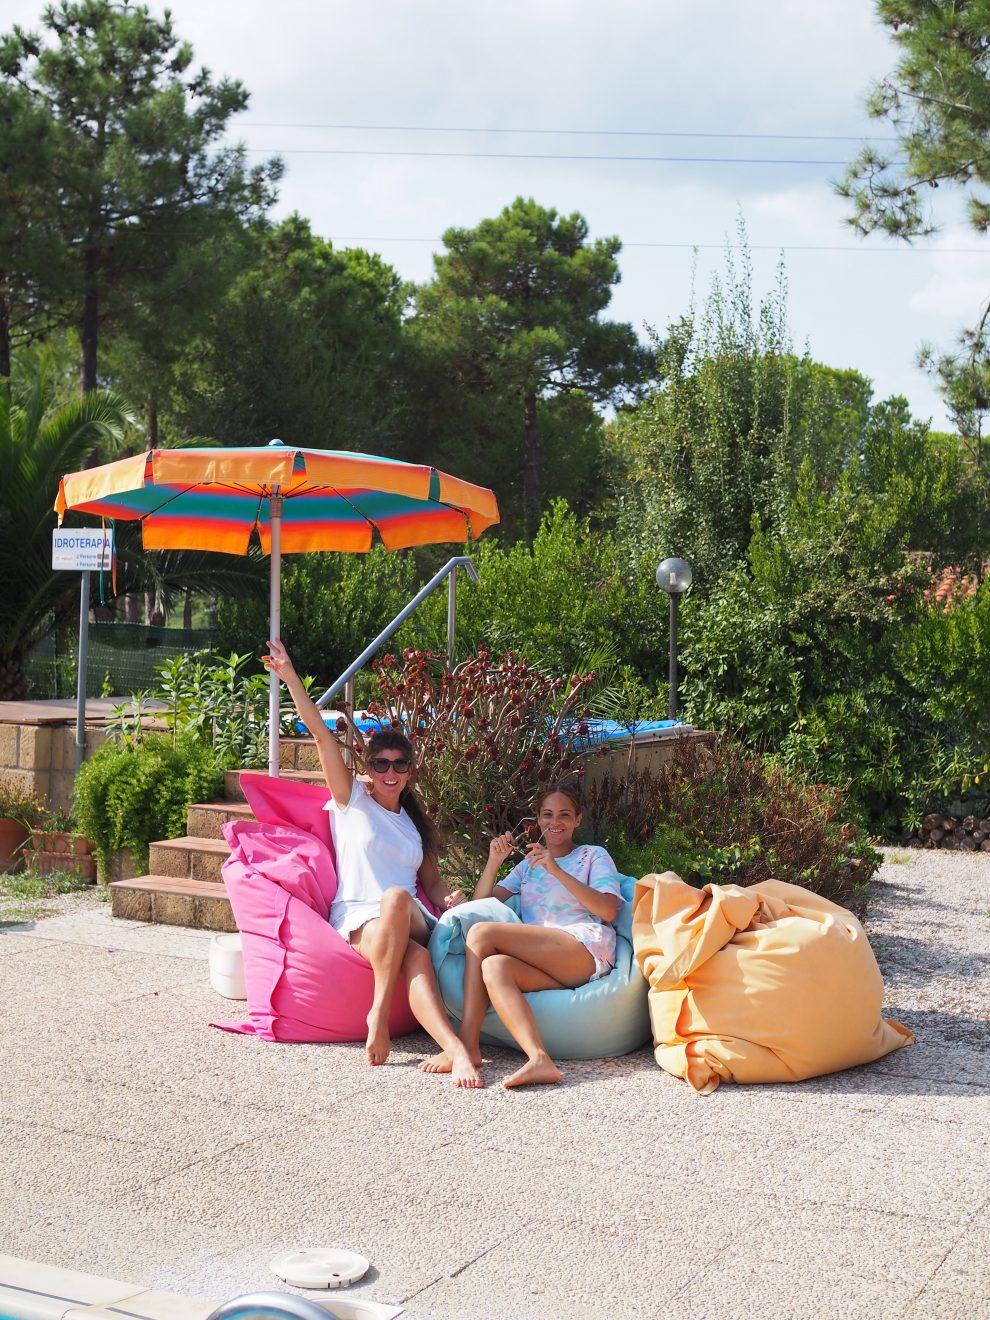 Lacona beach, Elba, Italie. glamping op Elba, zwembad camping Casa Dei Prati Chloe Sterk en Amandine Hach